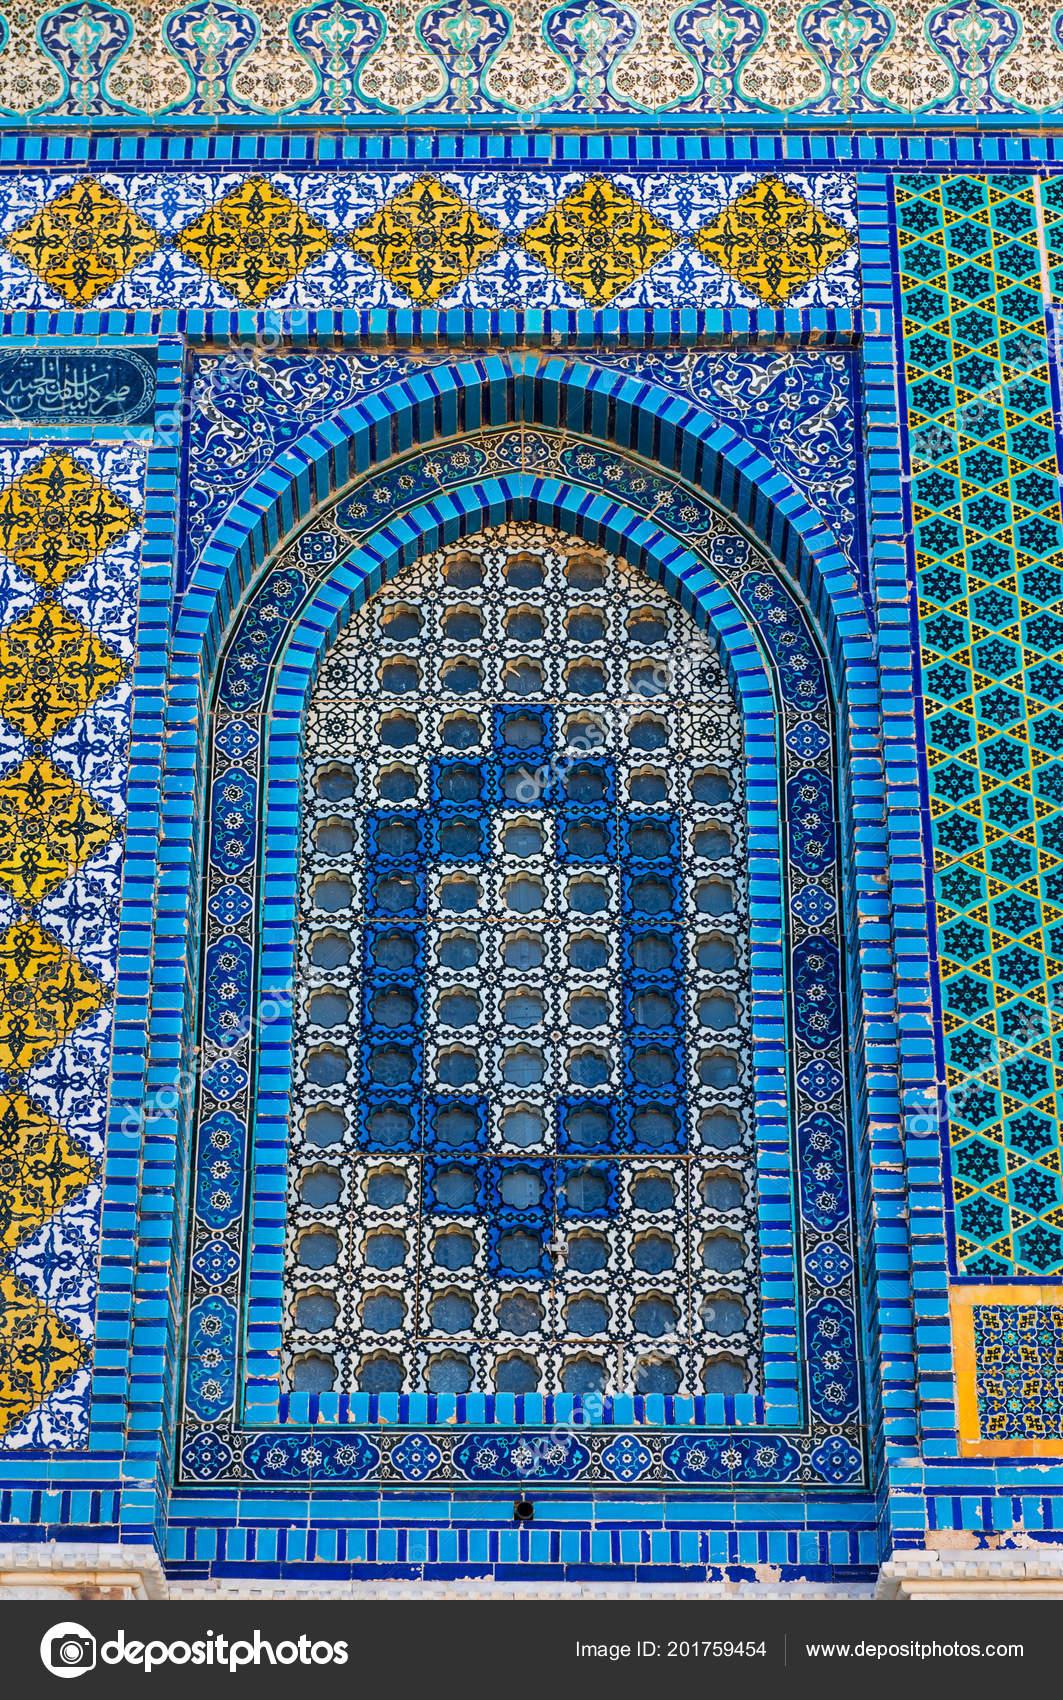 Colorful Islamic Pattern Mosaic Tiles Mosque Dome Rock Jerusalem ...